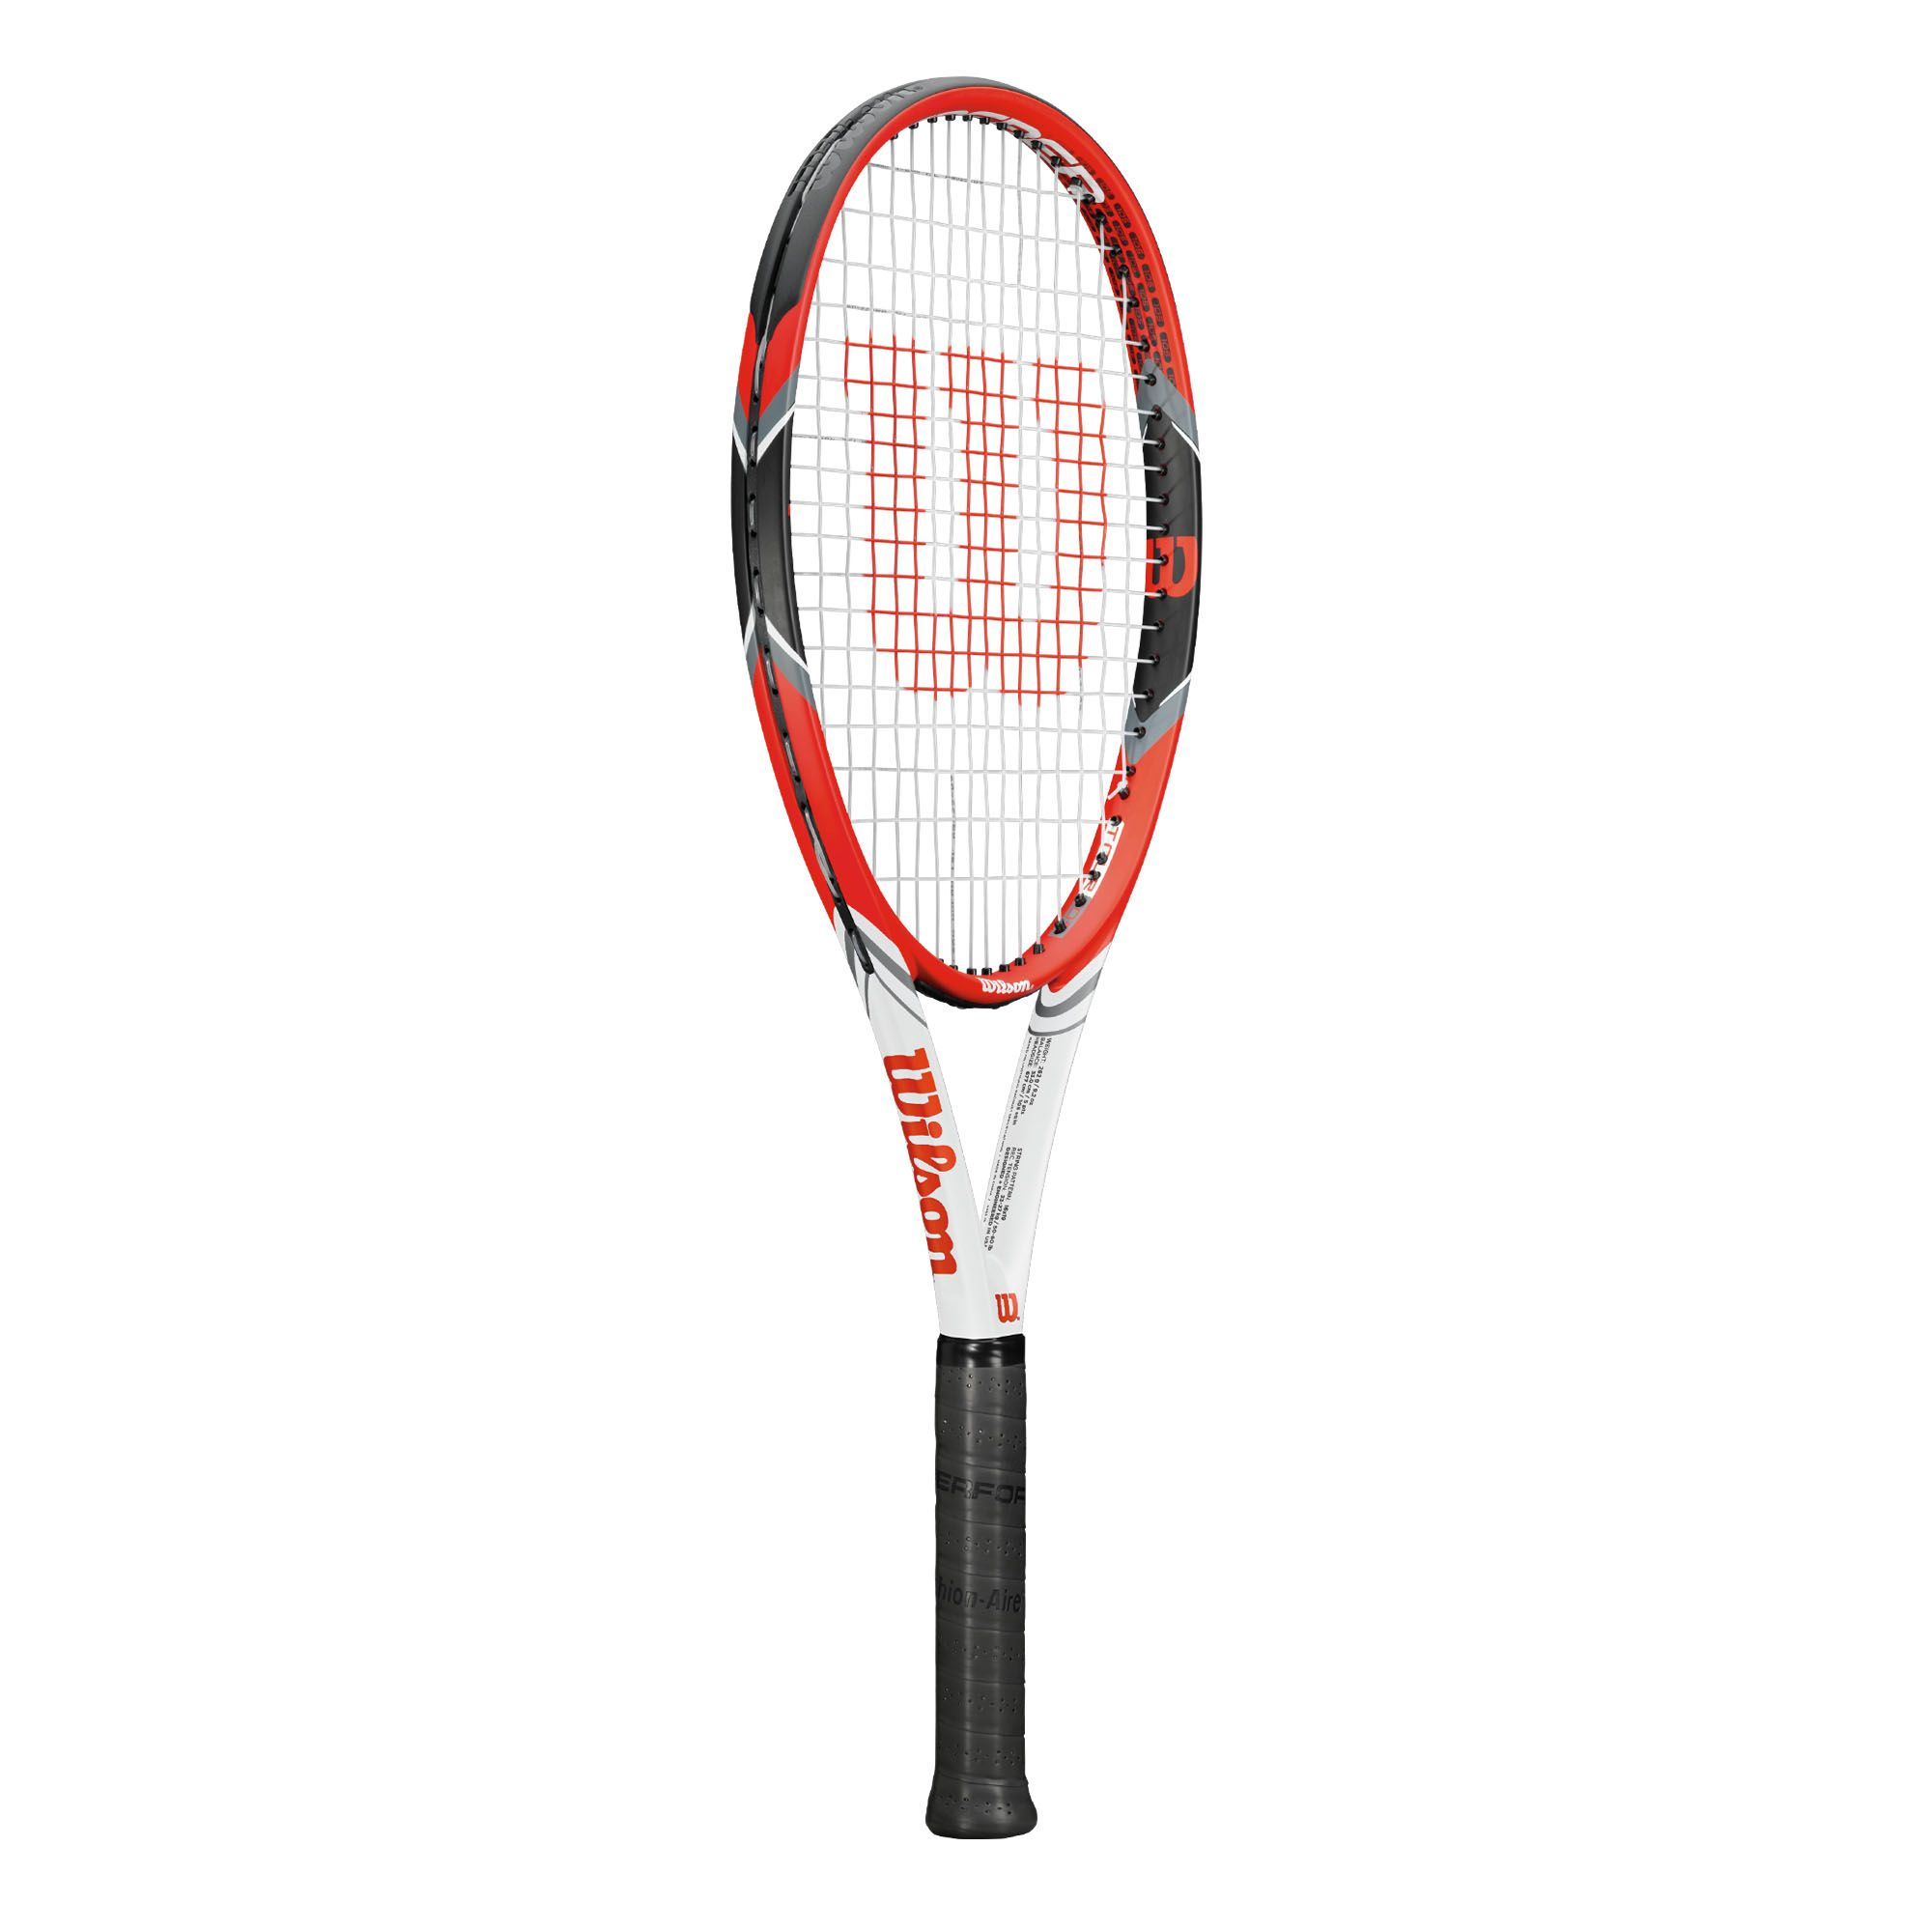 Wilson Federer Tour 105 Tennis Racket